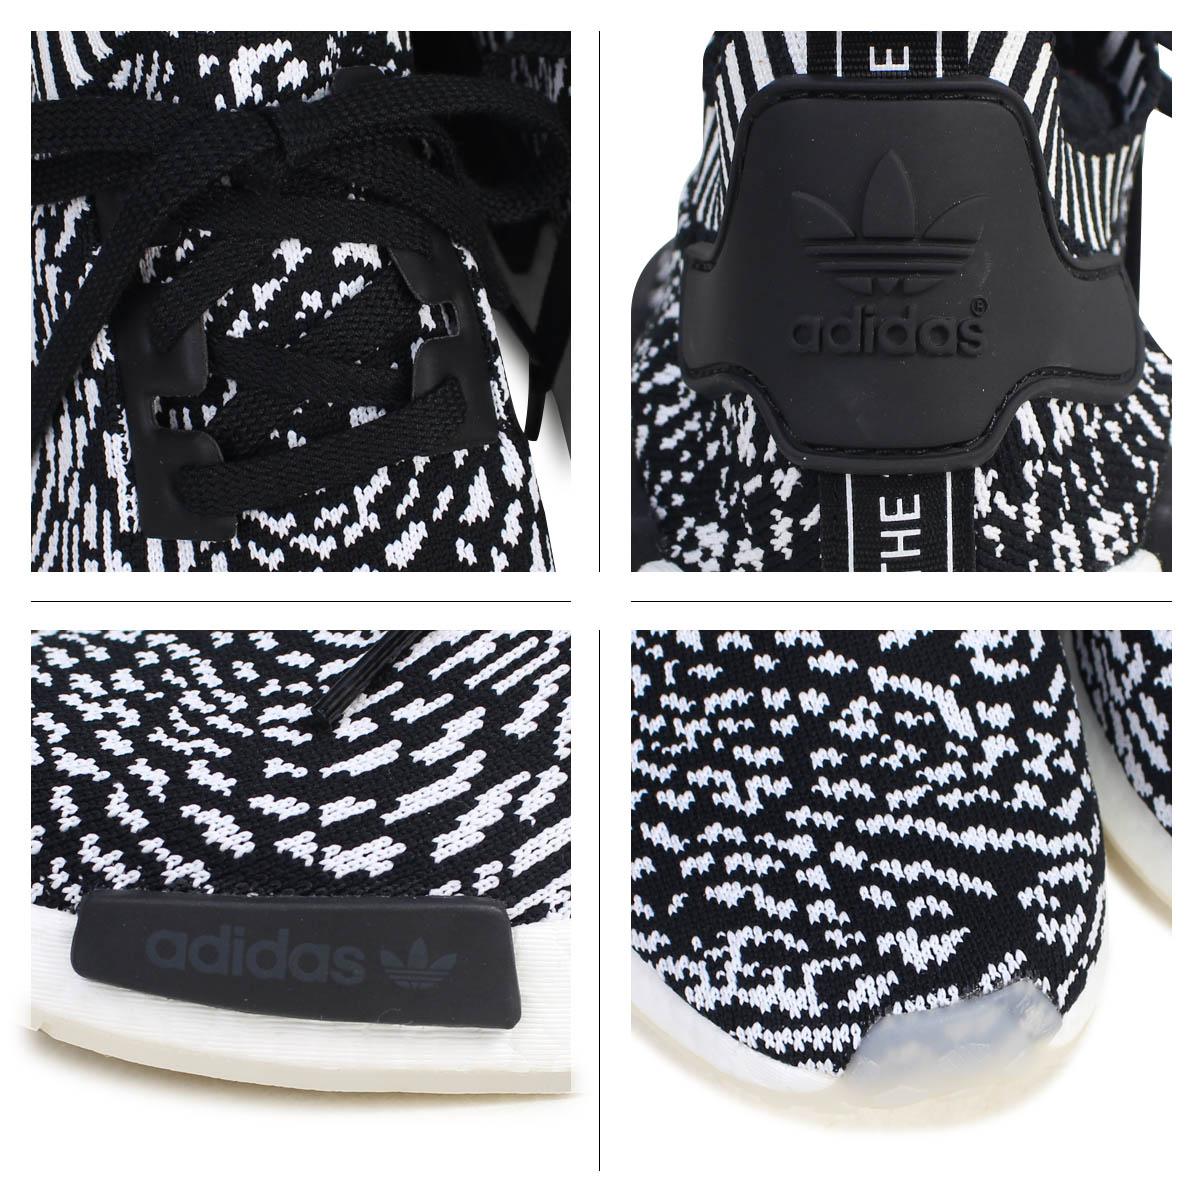 ce3176b26d749 adidas NMD R1 PK Adidas originals sneakers N M D nomad men BY3013 ZEBRA PACK  shoes black  8 16 Shinnyu load   178